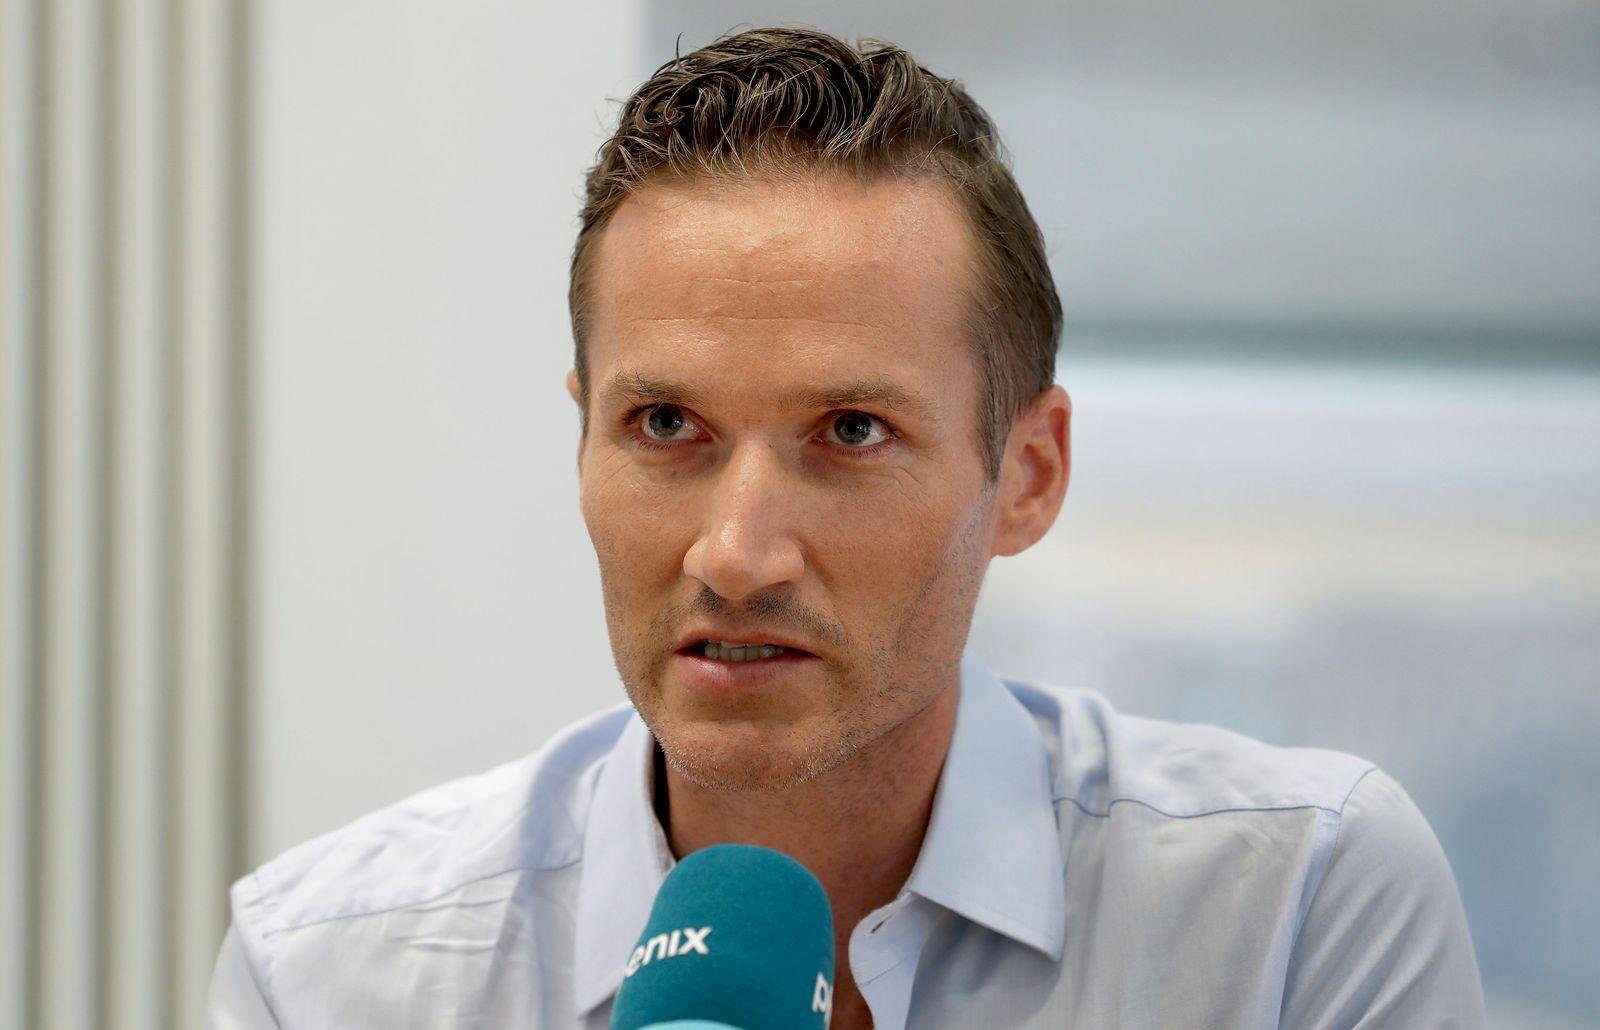 Niklas Oestberg